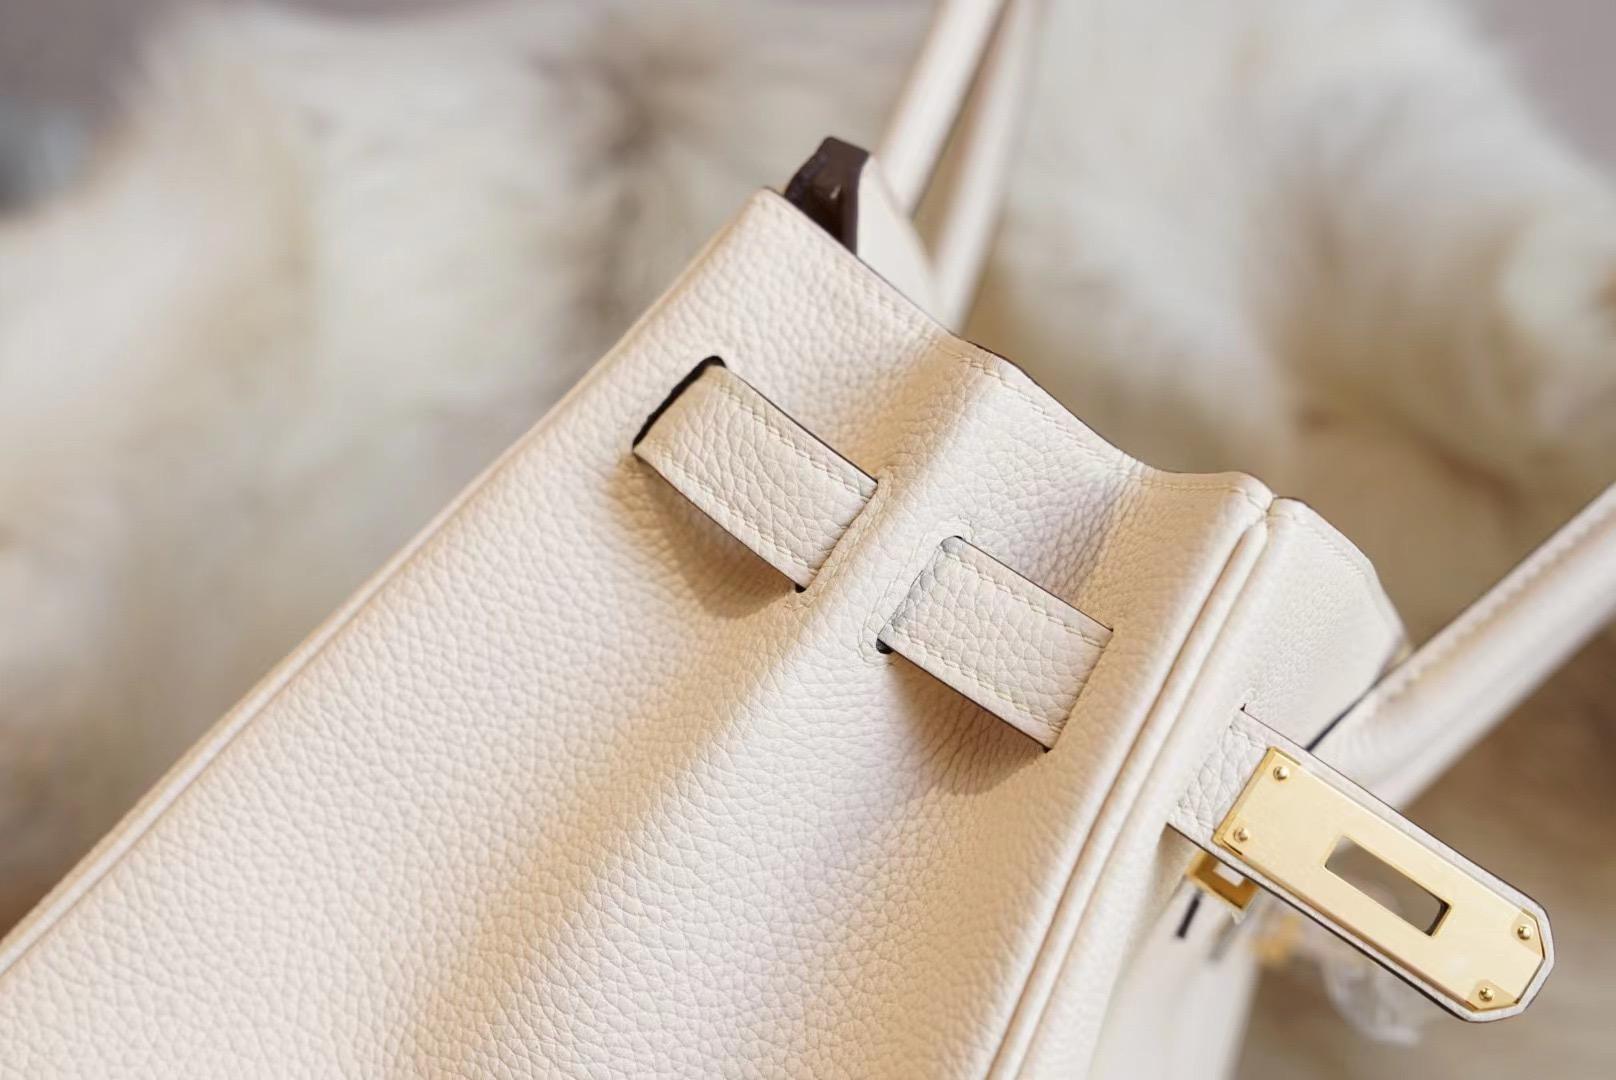 Hermes Birkin Nata 奶油白 BK30 原厂 Togo皮 法国蜡线 全手缝